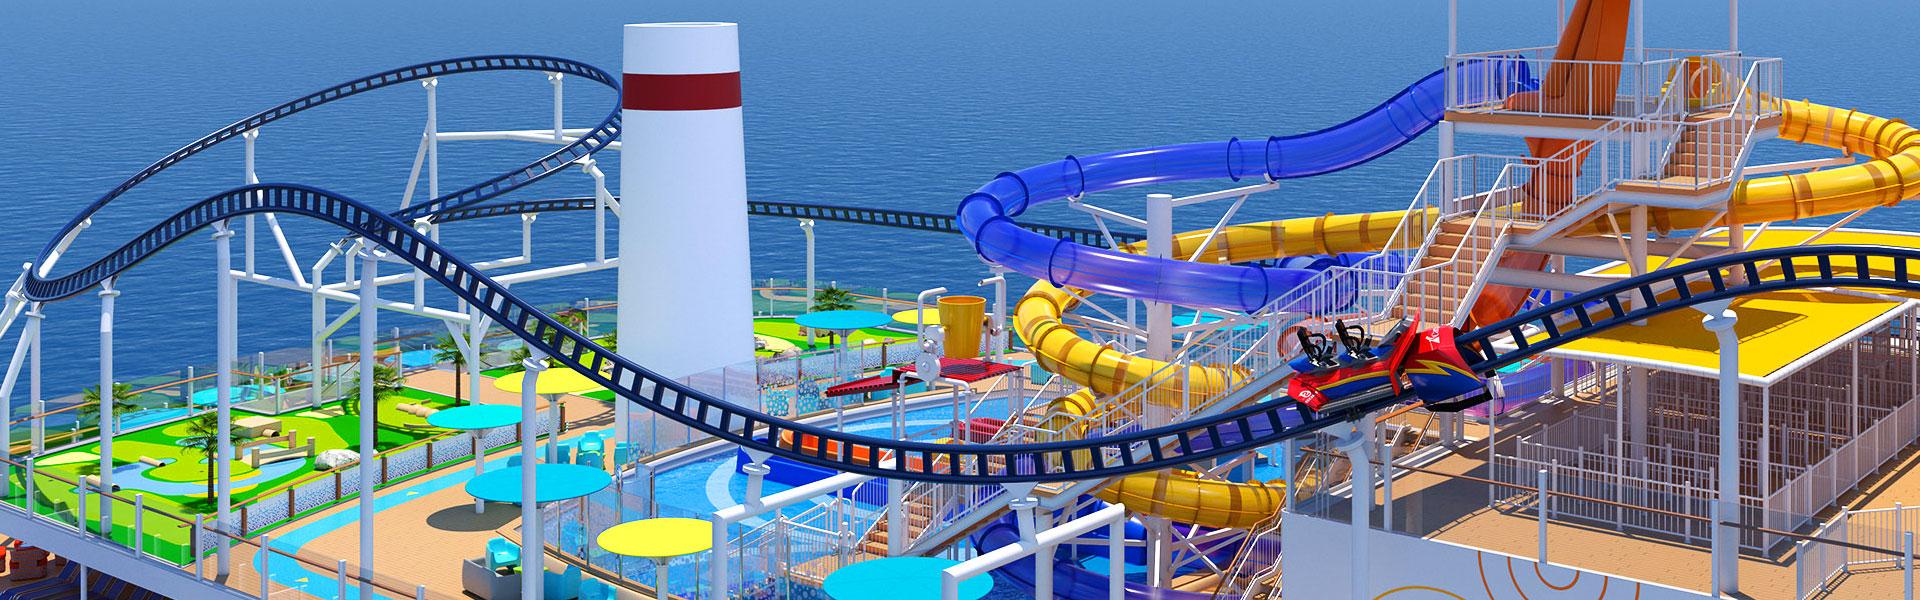 Carnival Mardi Gras Cruise Ship Rollercoaster